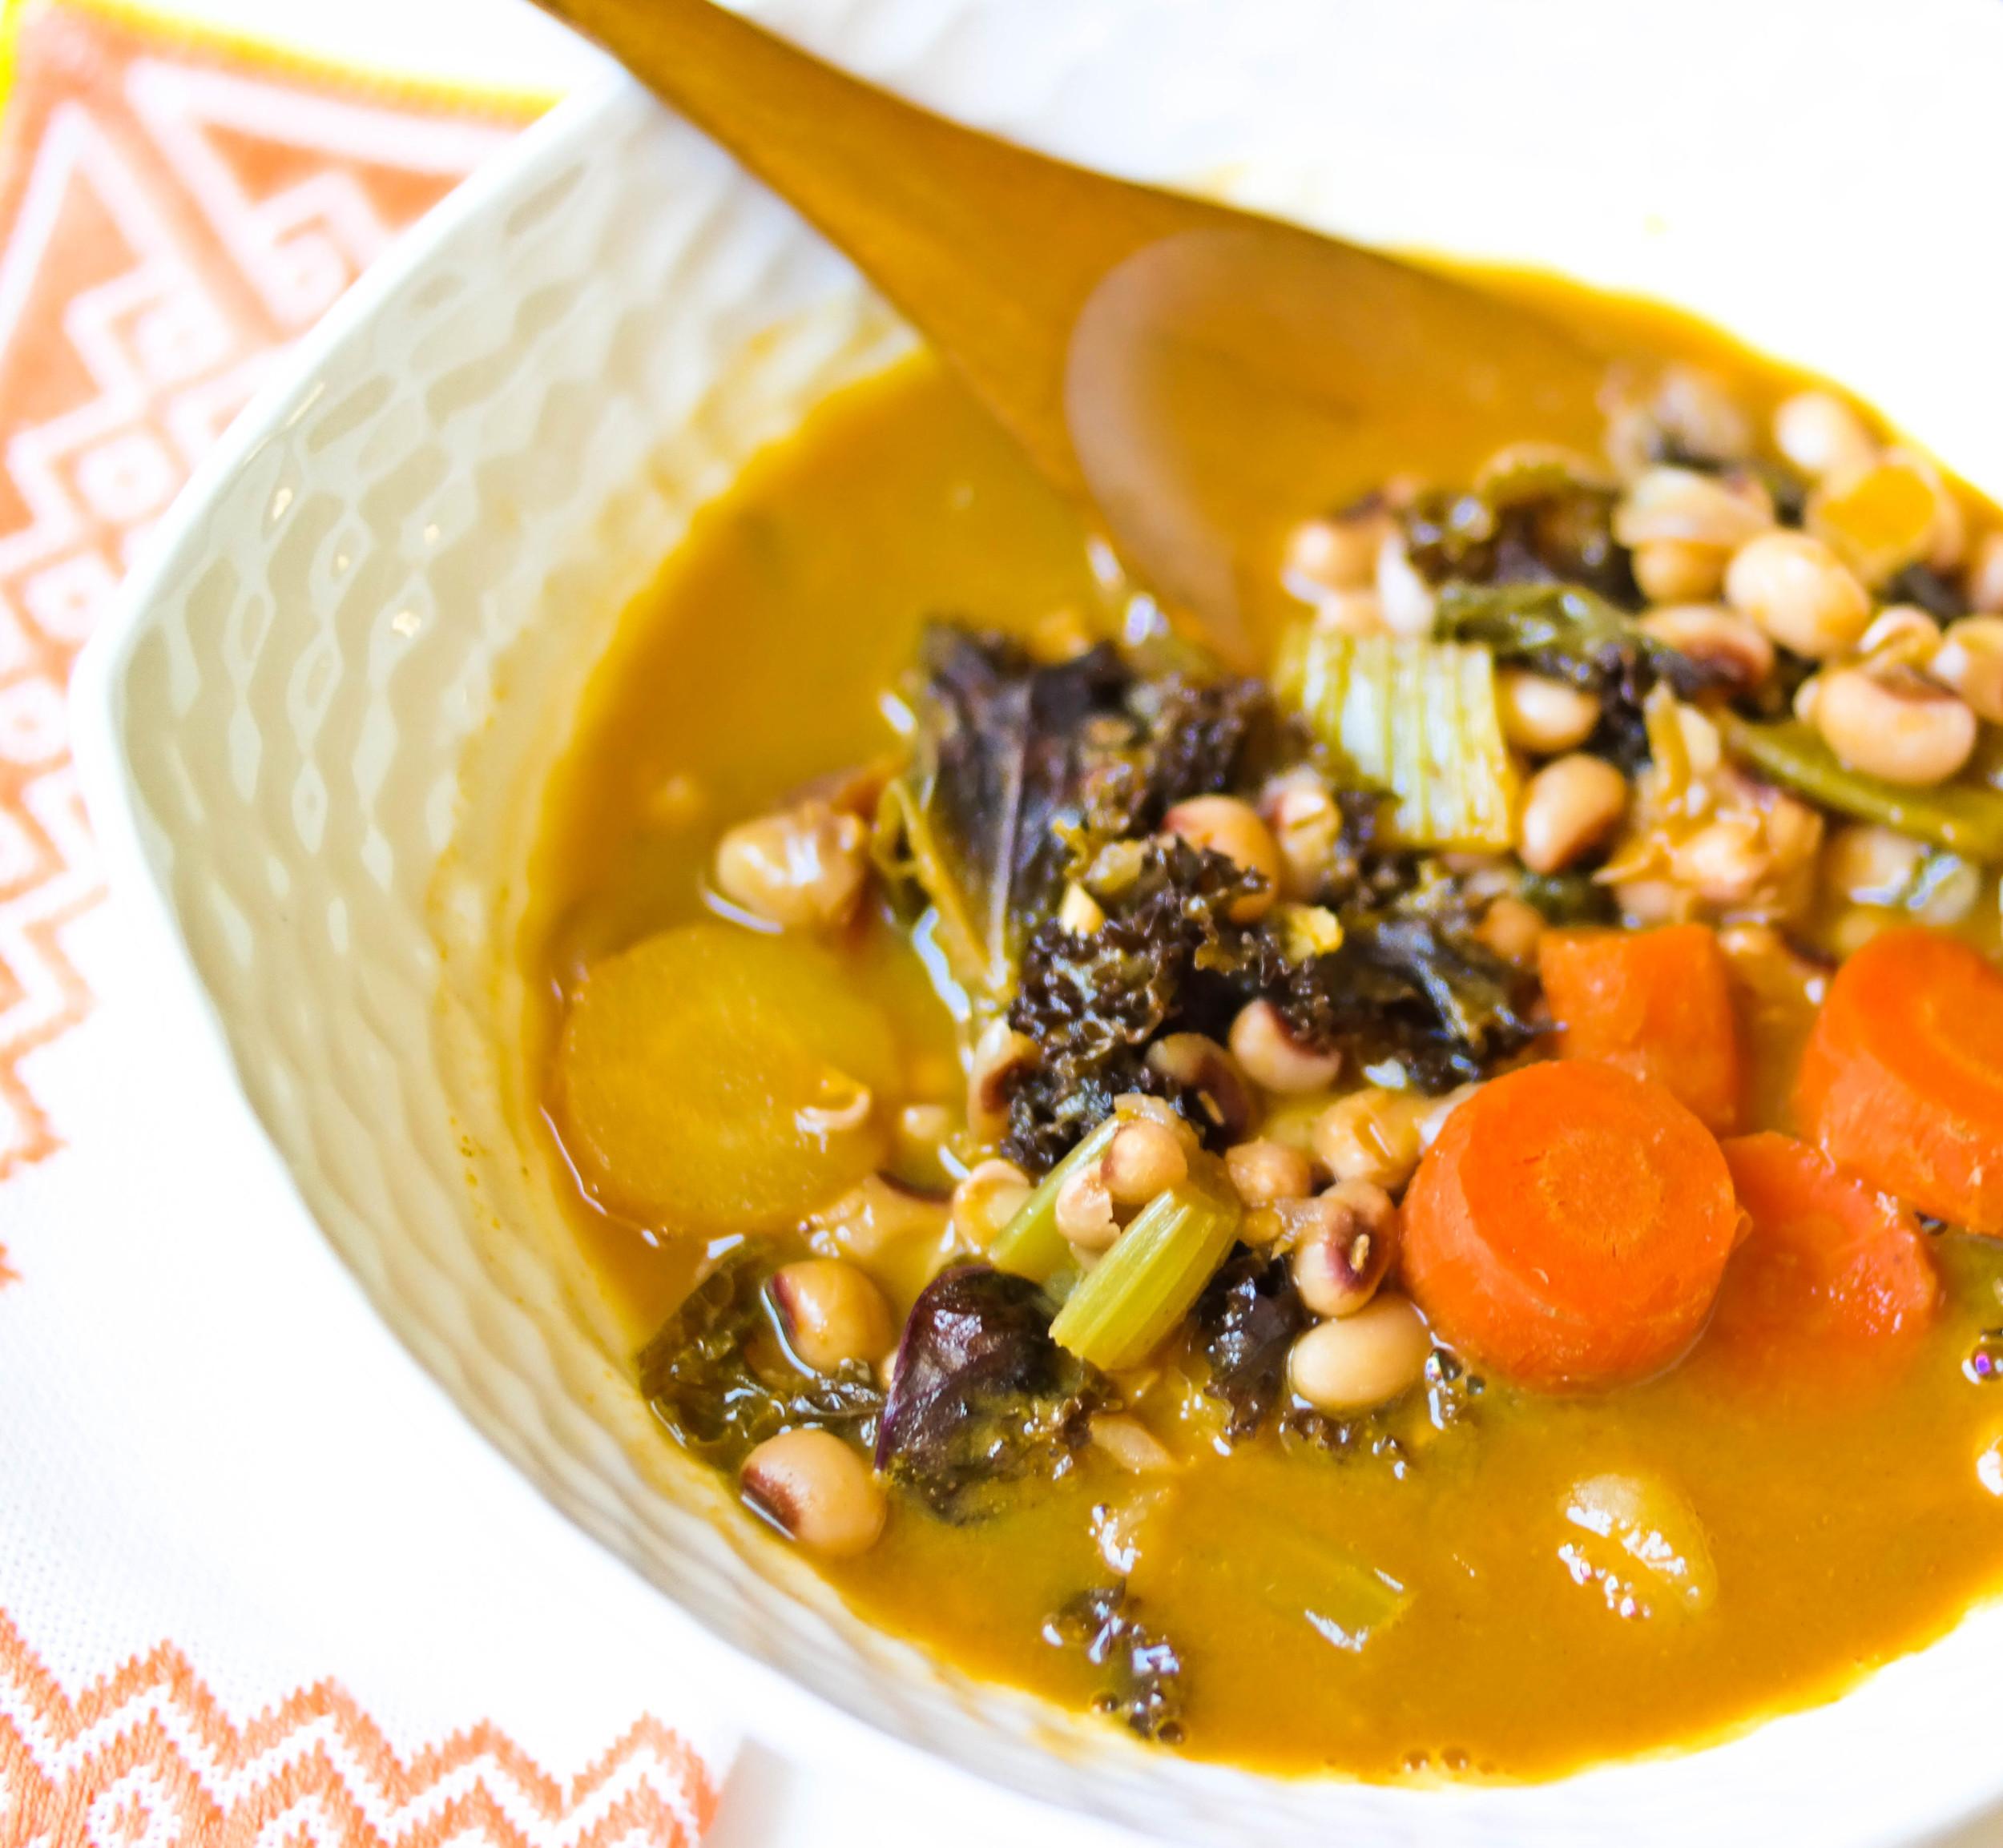 Warming-Vegetable-and-Black-Eyed-Peas-Soup | www.8thandlake.com